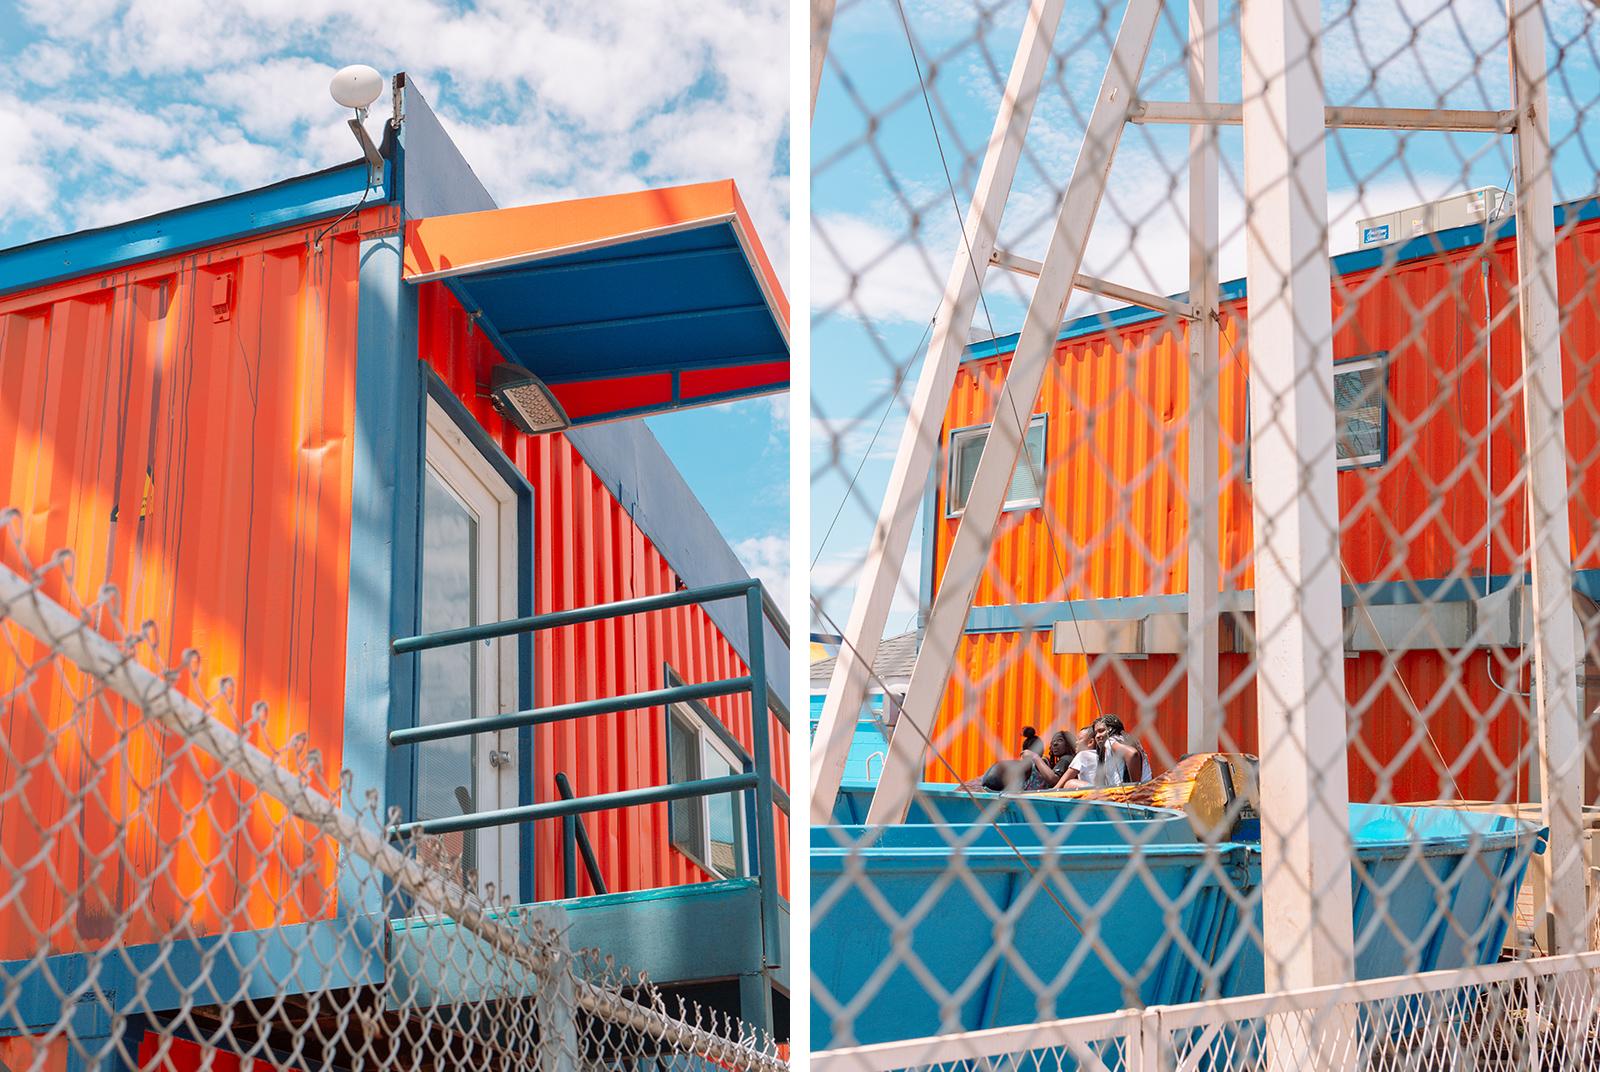 coney-island-2019-cp-web-09.jpg